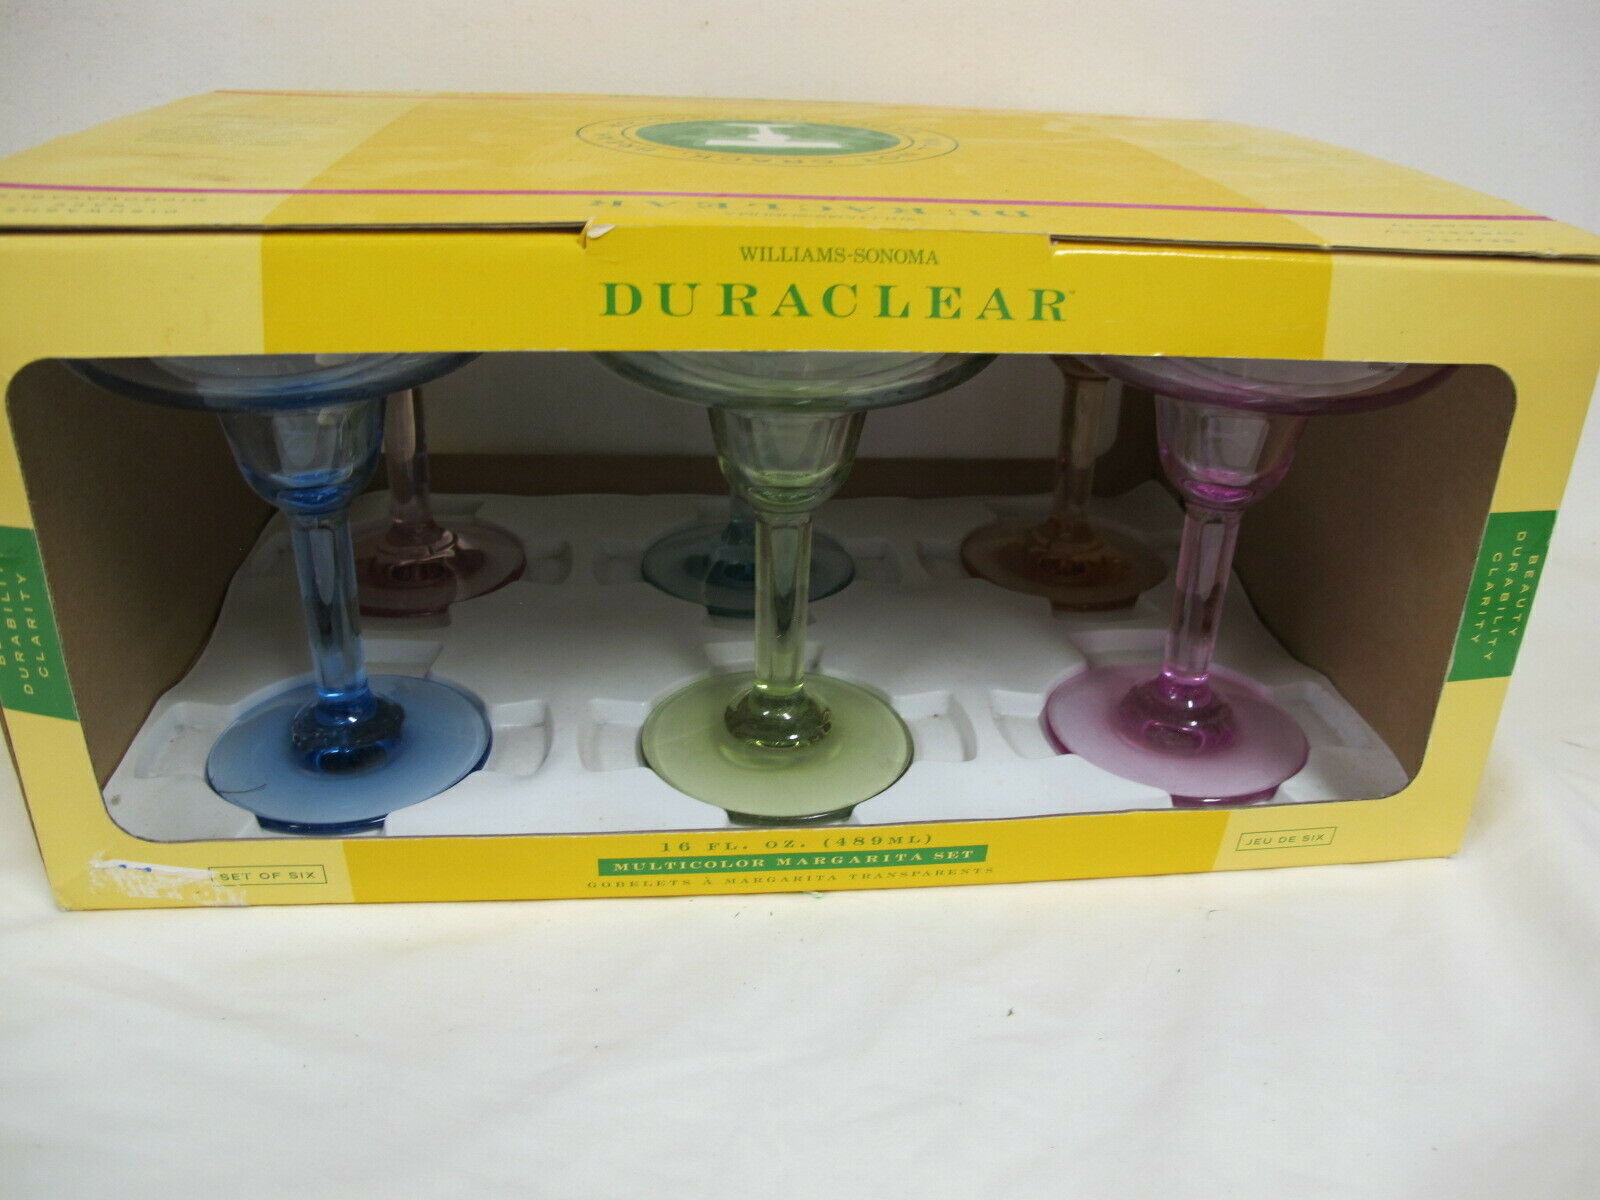 WILLIAMS SONOMA DURACLEAR MARGARITA GLASSES (6) SET IN BOX MULTI COLOR